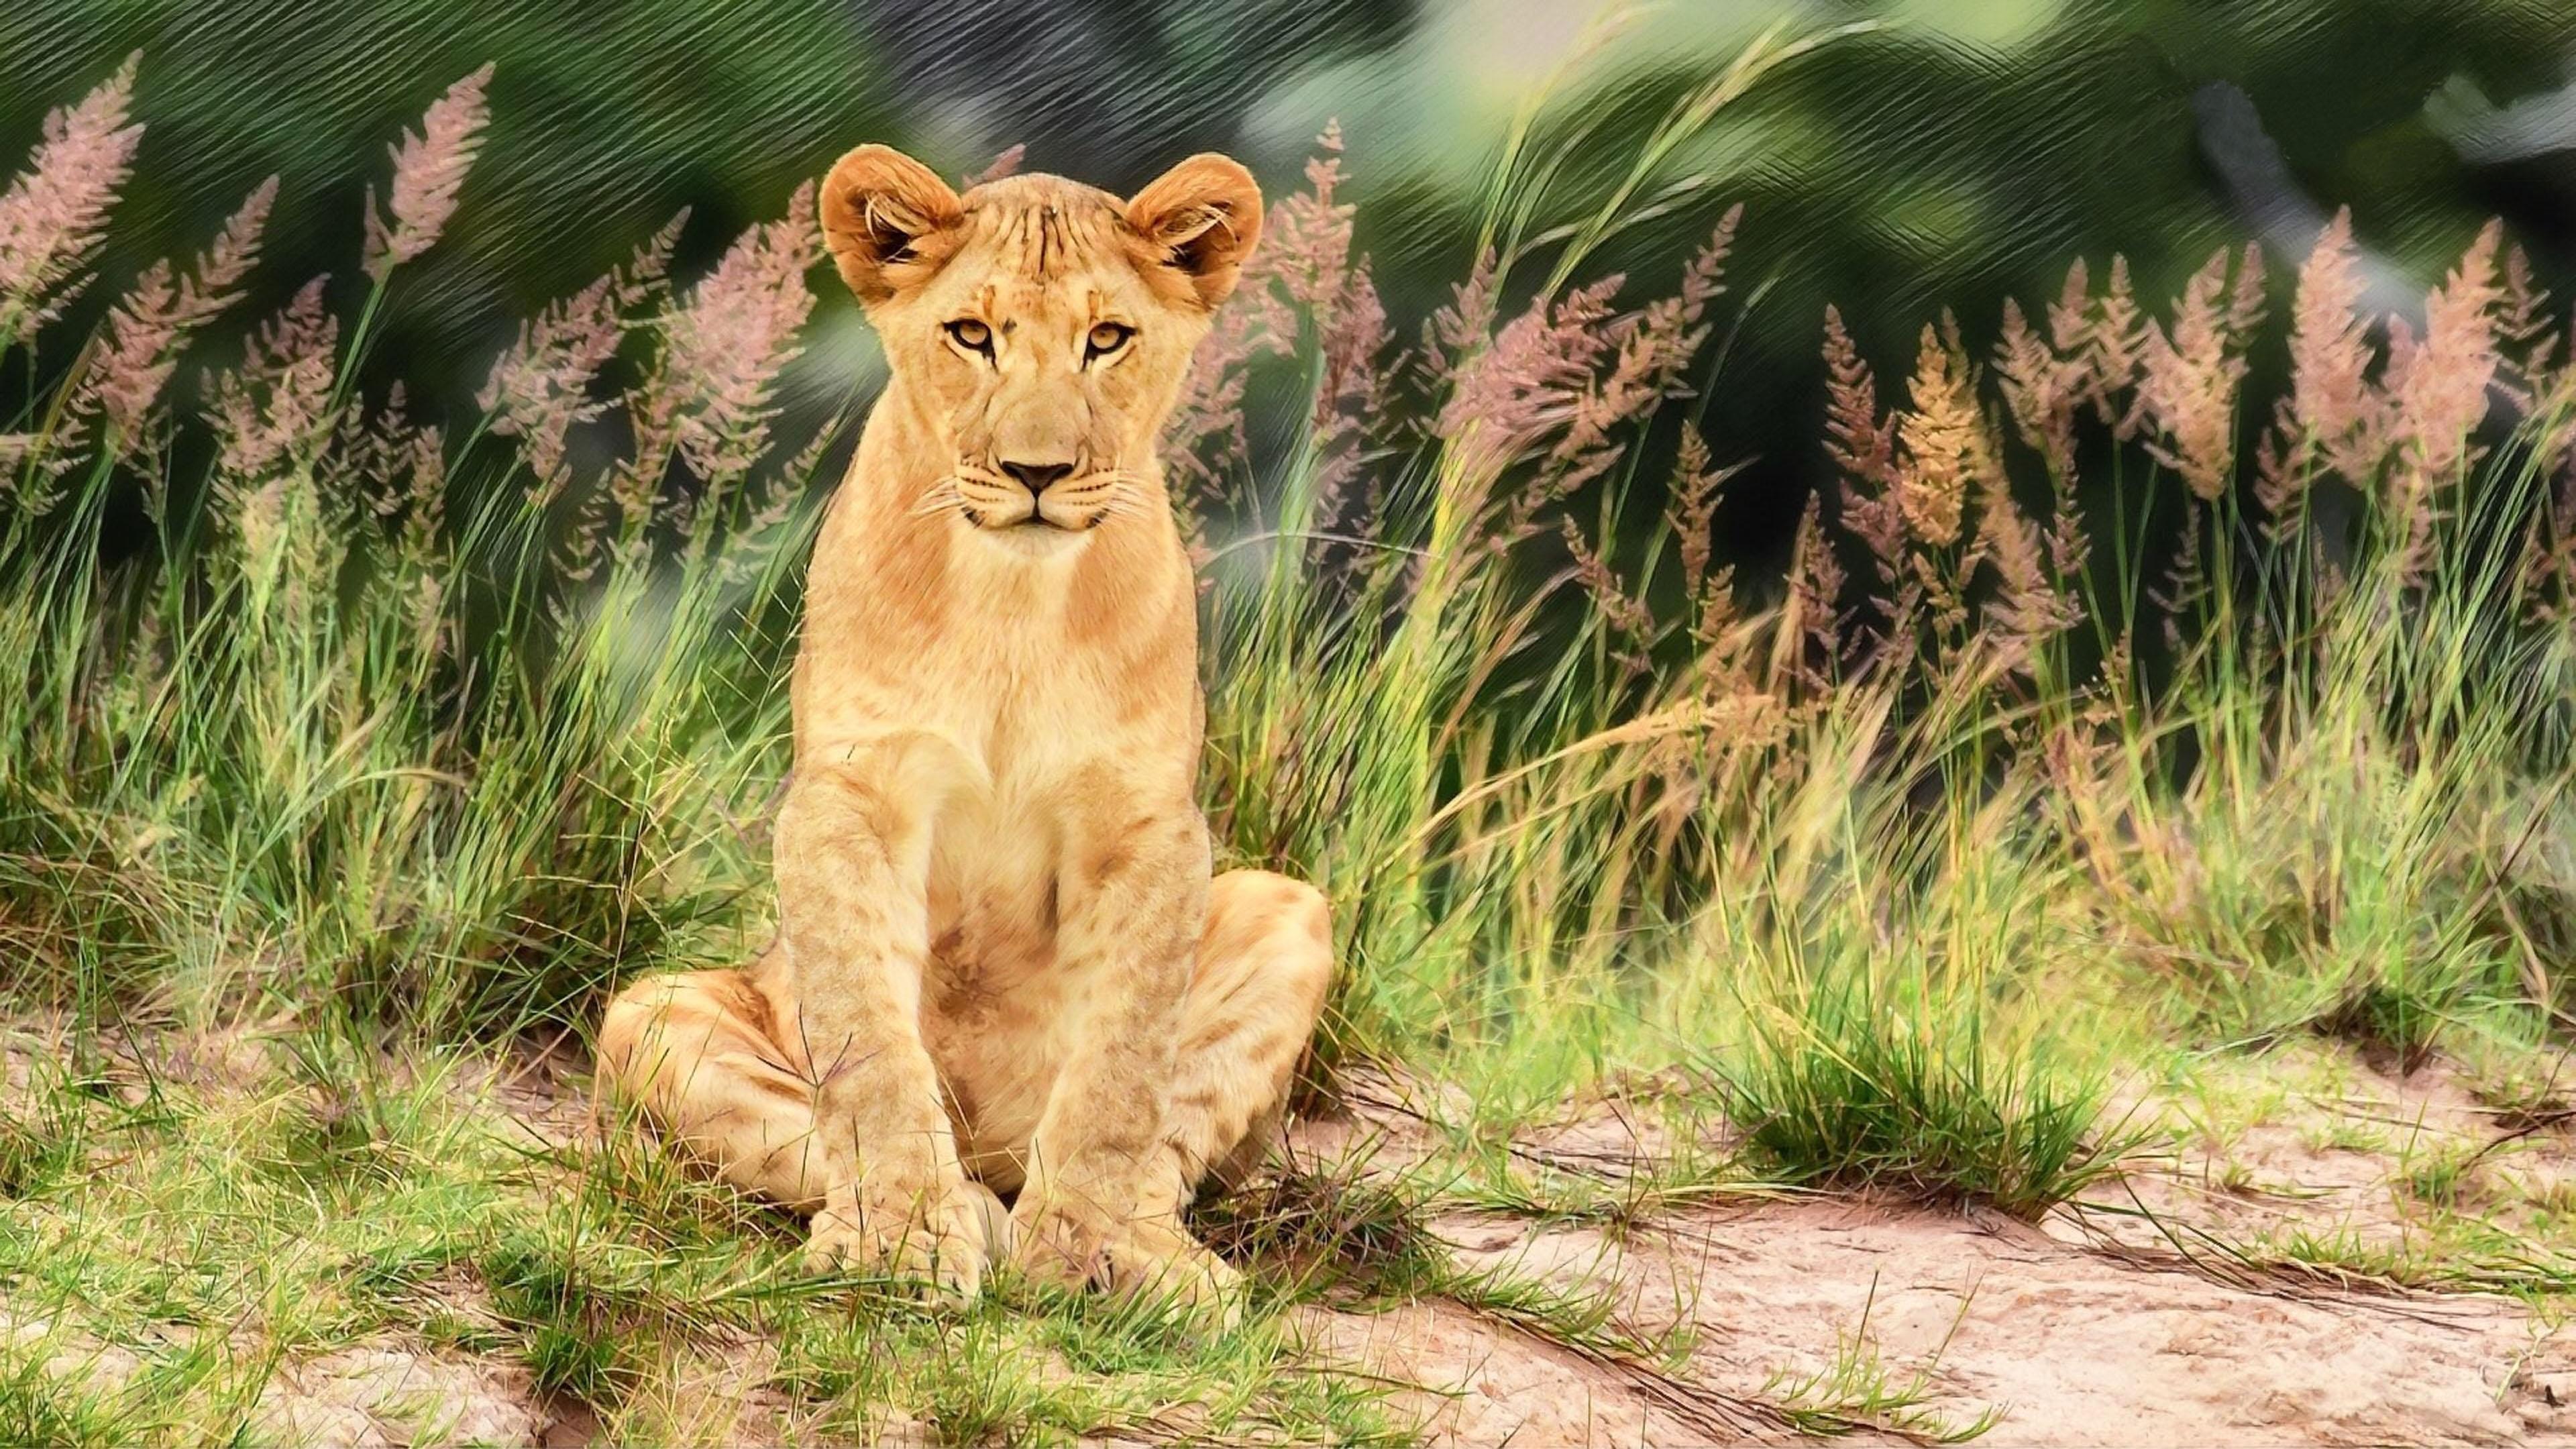 Animal Wallpaper Desktop Background Wild Animal Young Male Lion 4k Ultra Hd Tv Wallpaper For